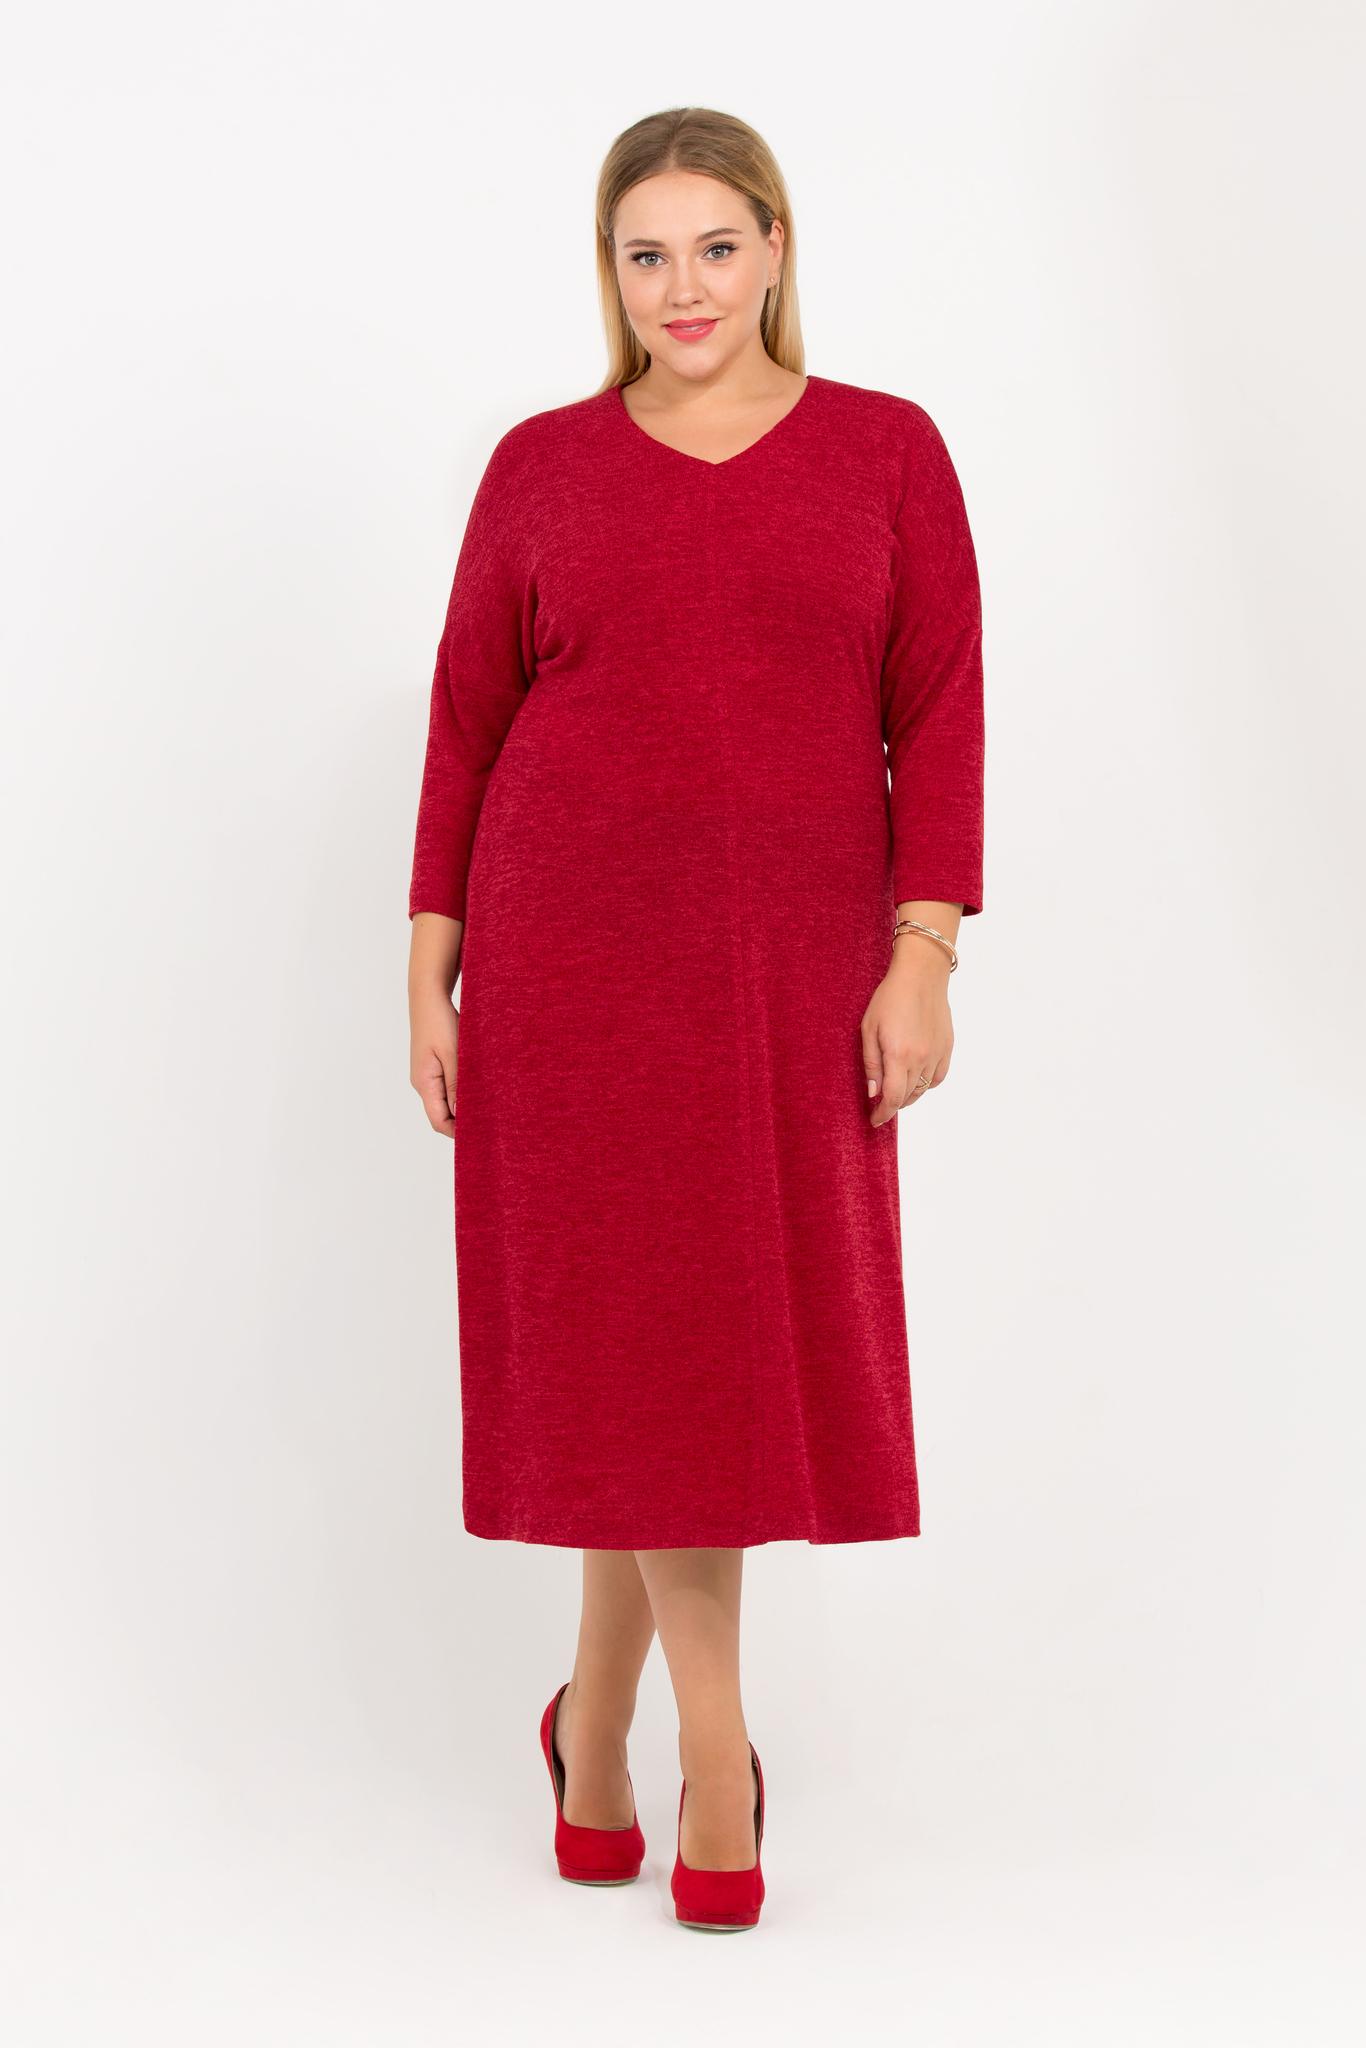 Платья Платье Ева красное 93f09c3b555a01476f1032e89524cde4.jpg